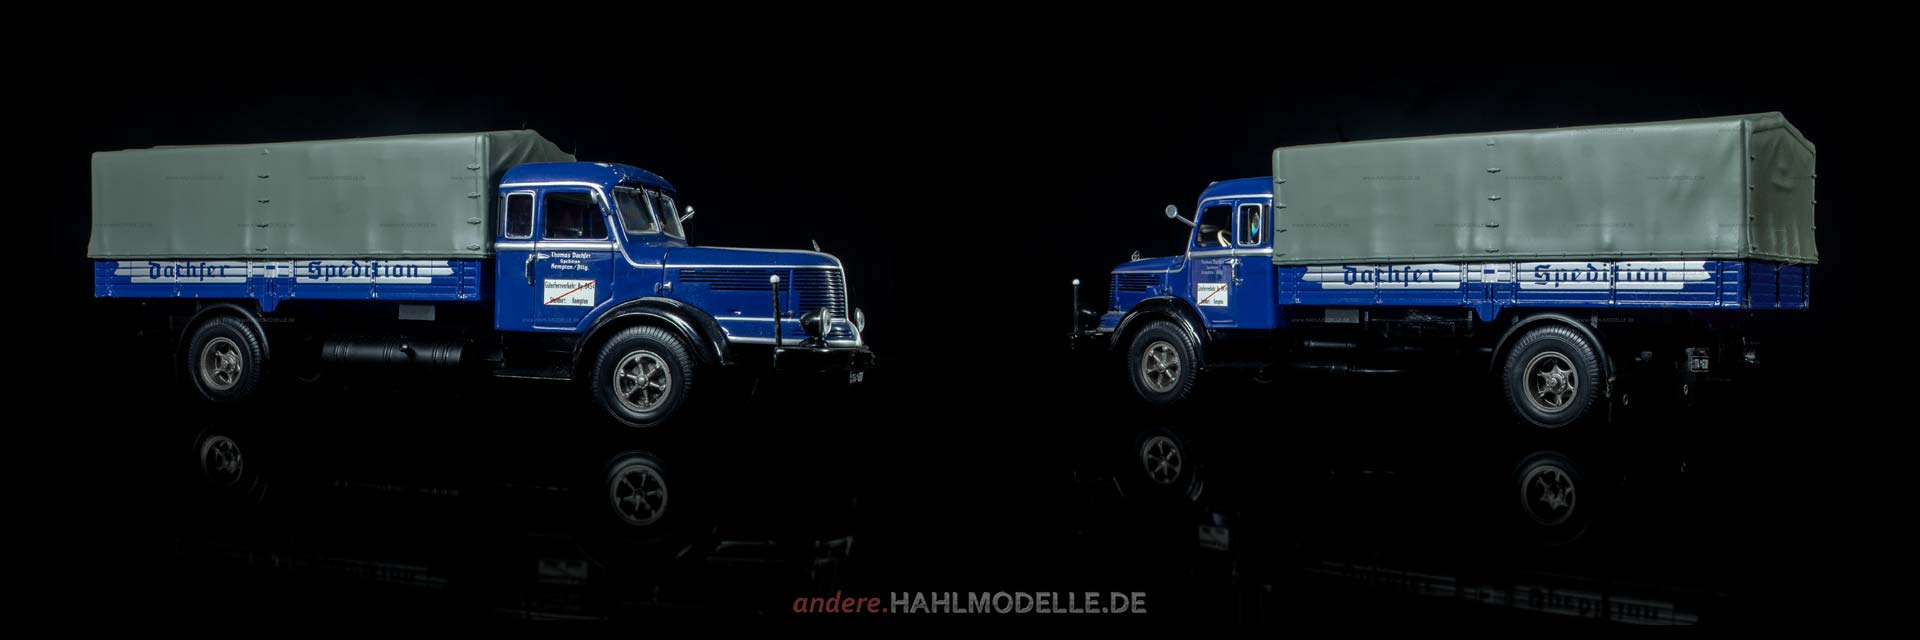 Krupp-Südwerke Titan S 80 | LKW Pritsche/Plane | Minichamps | 1:43 | www.andere.hahlmodelle.de